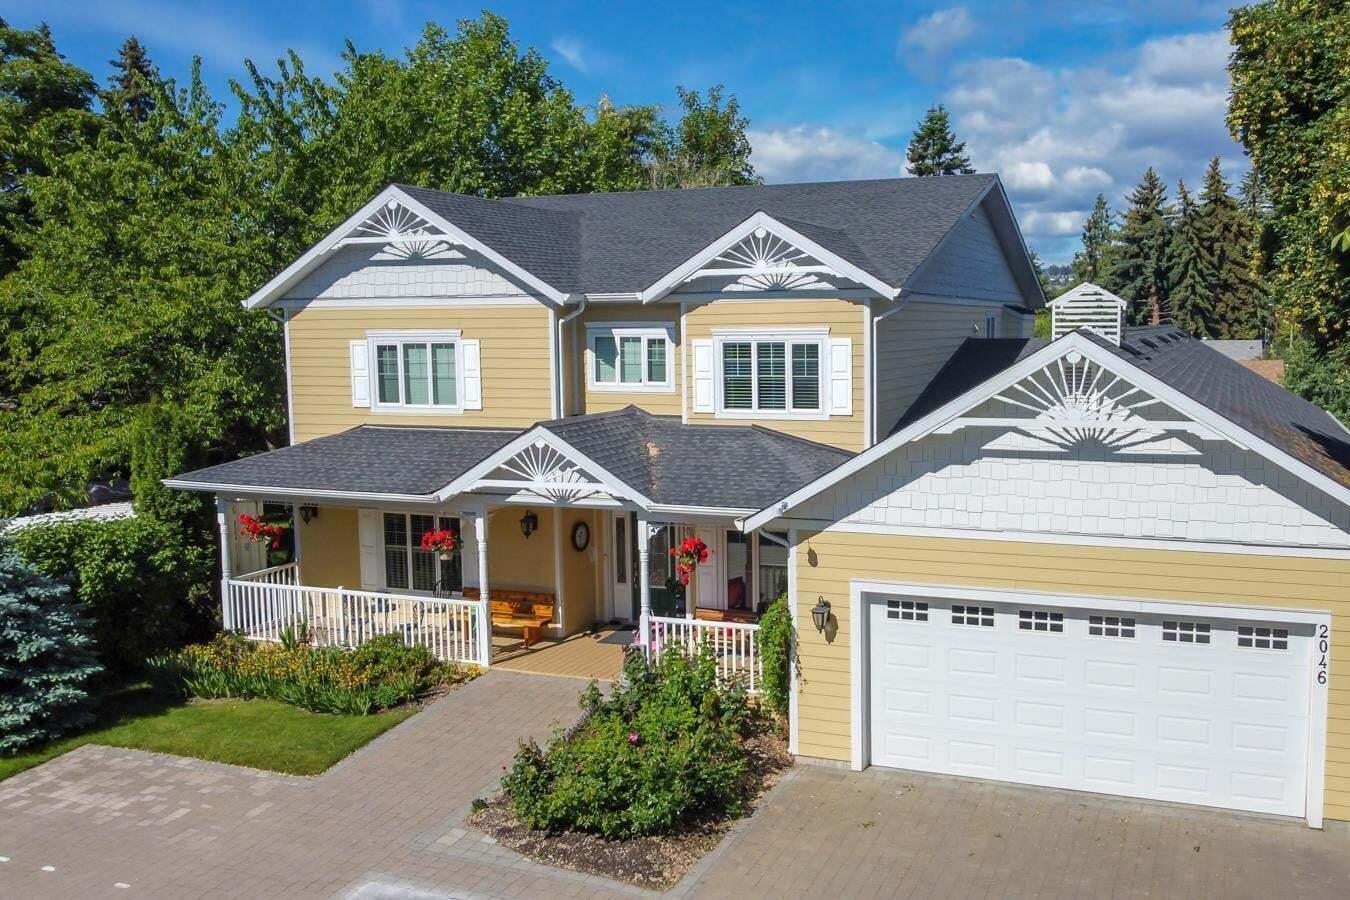 House for sale at 2046 Pandosy St Kelowna British Columbia - MLS: 10207198